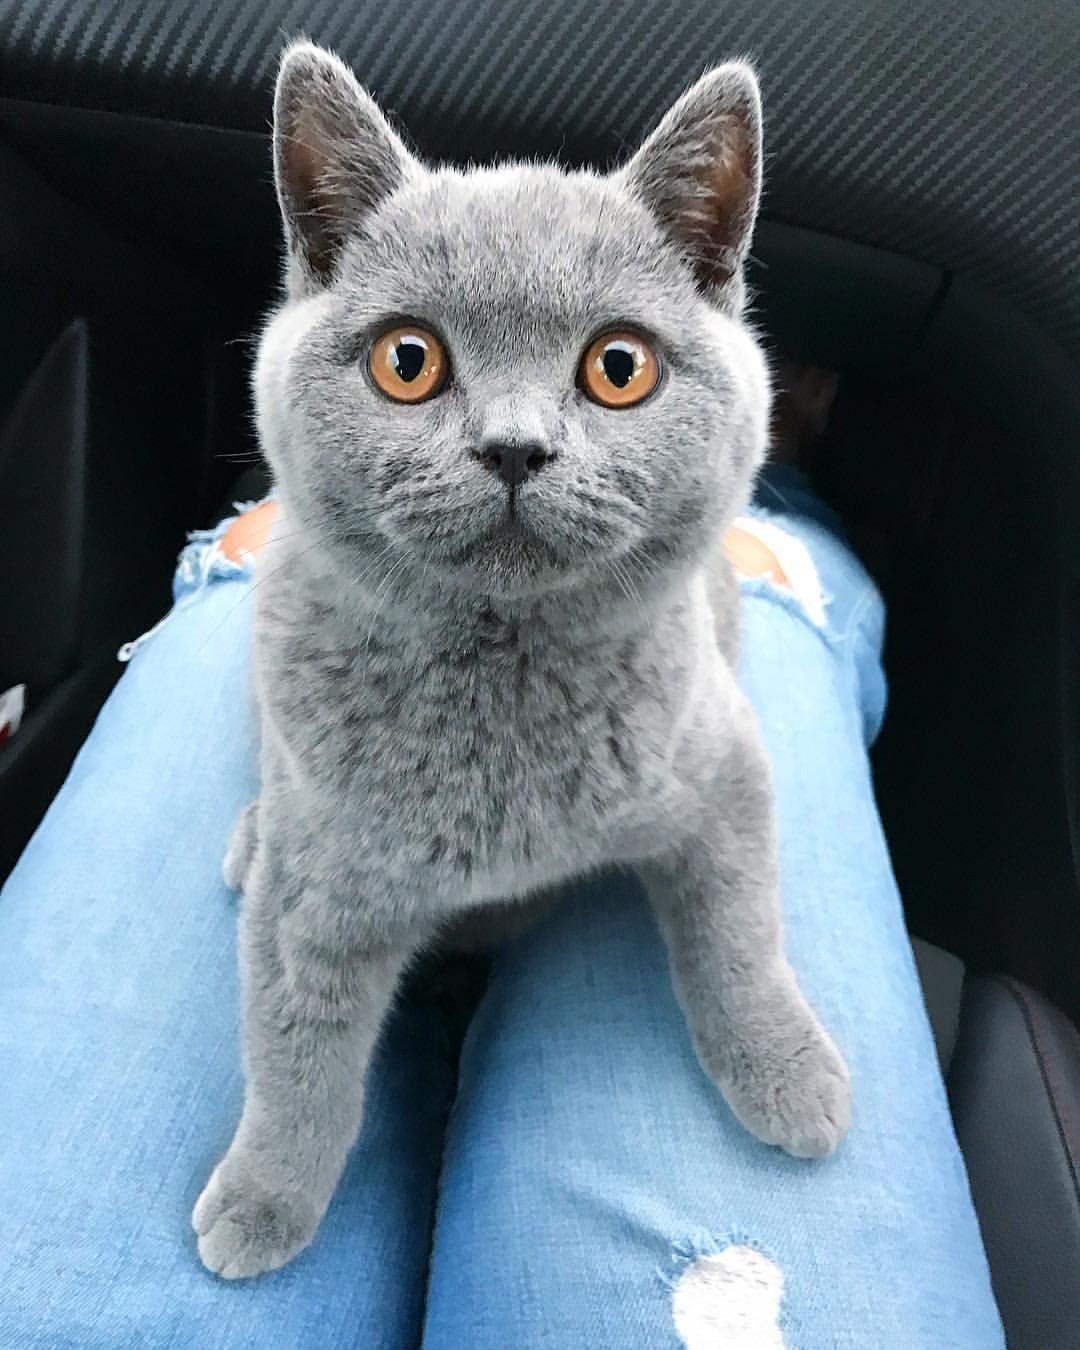 British Shorthair Colourpoint Kitten Cute Cats And Kittens Kittens Cutest British Shorthair Kittens